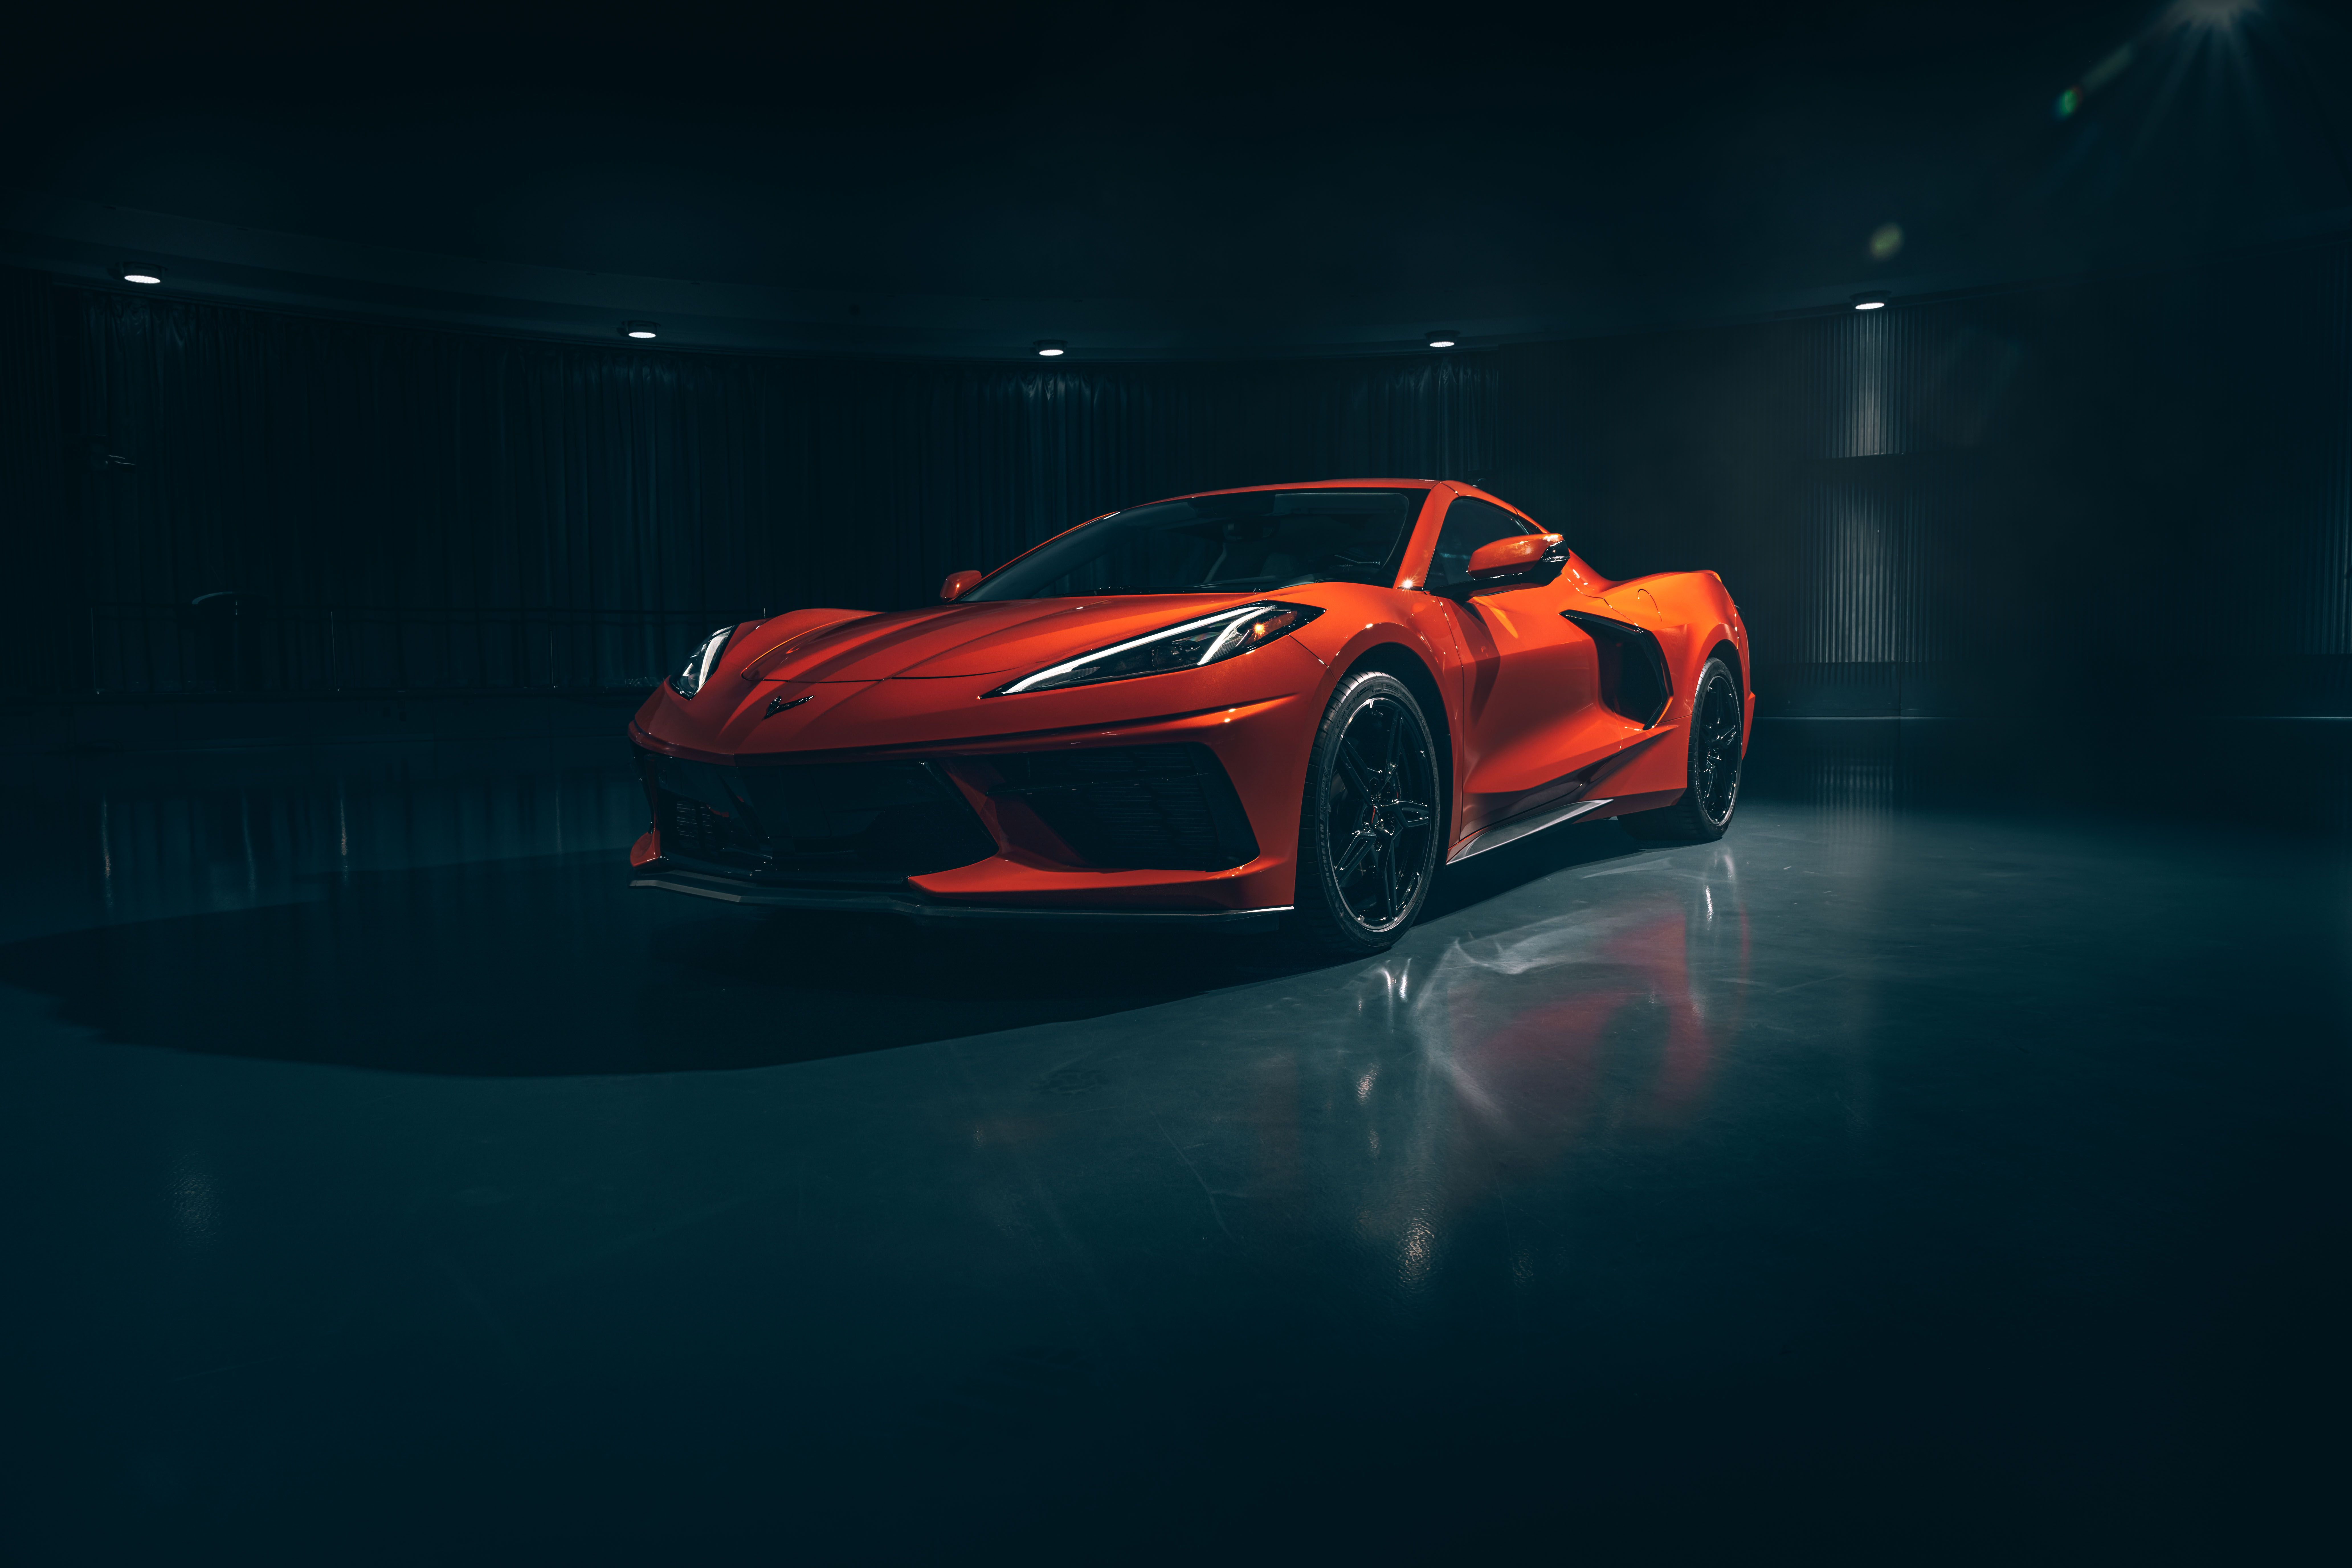 2020 Chevy Corvette Stingray C8 Hd Cars 4k Wallpapers Images